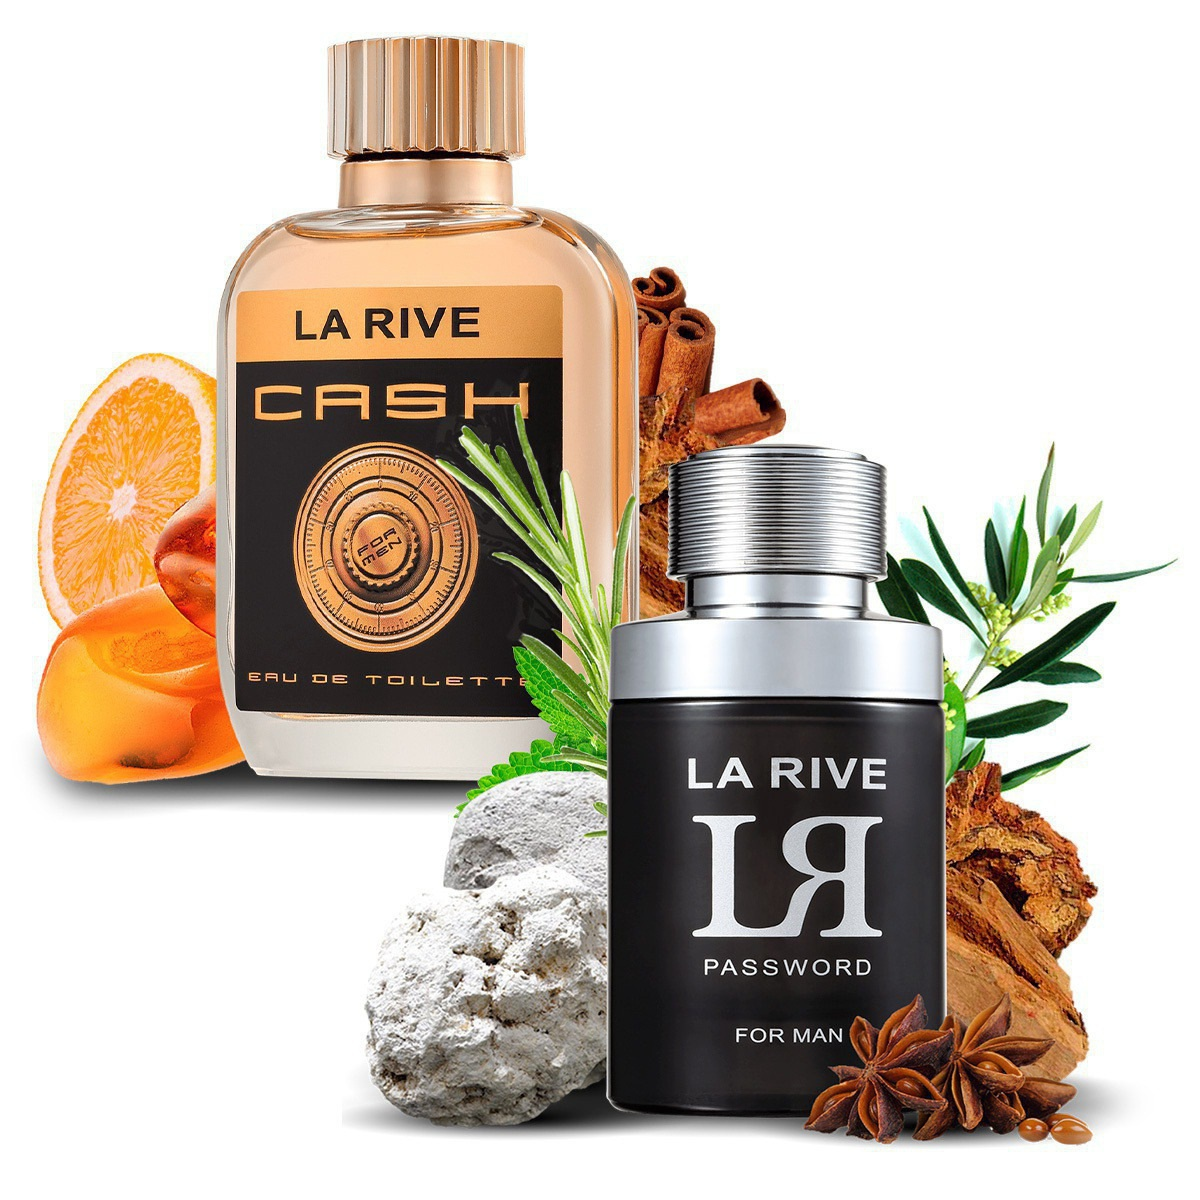 Kit 2 Perfumes Importados Cash Man e LR Password La Rive